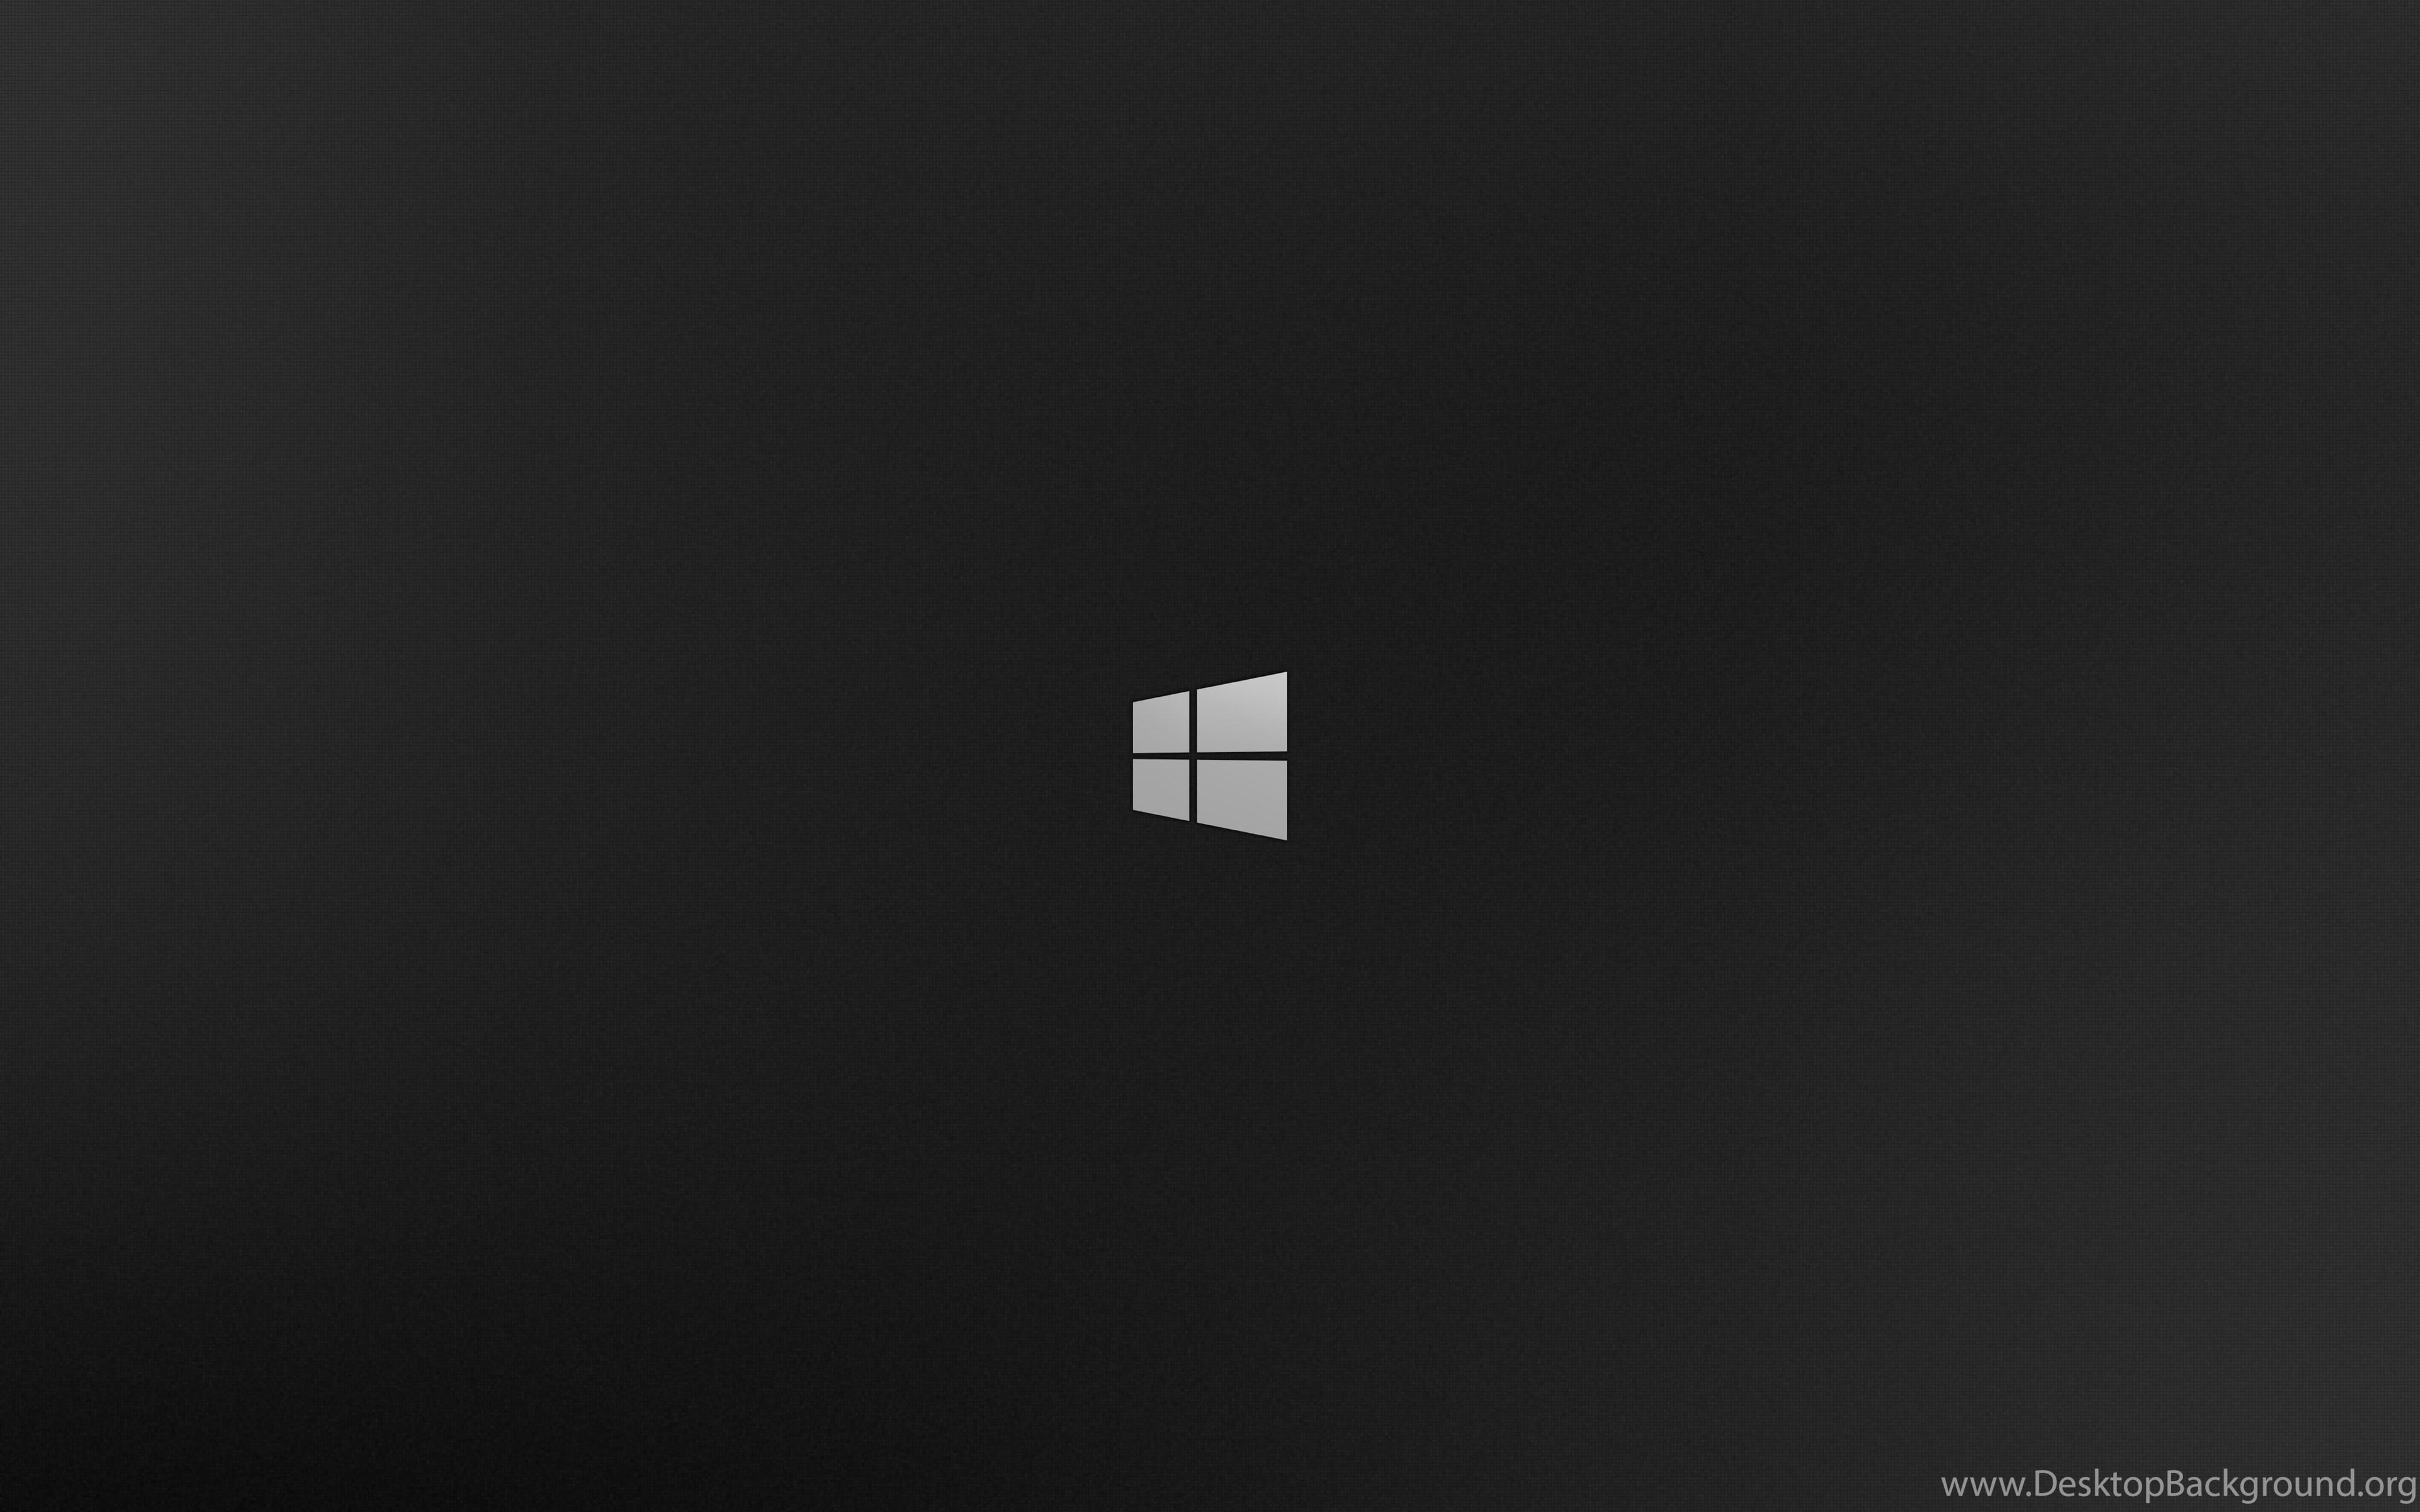 Desktop Background Is Black Windows 10